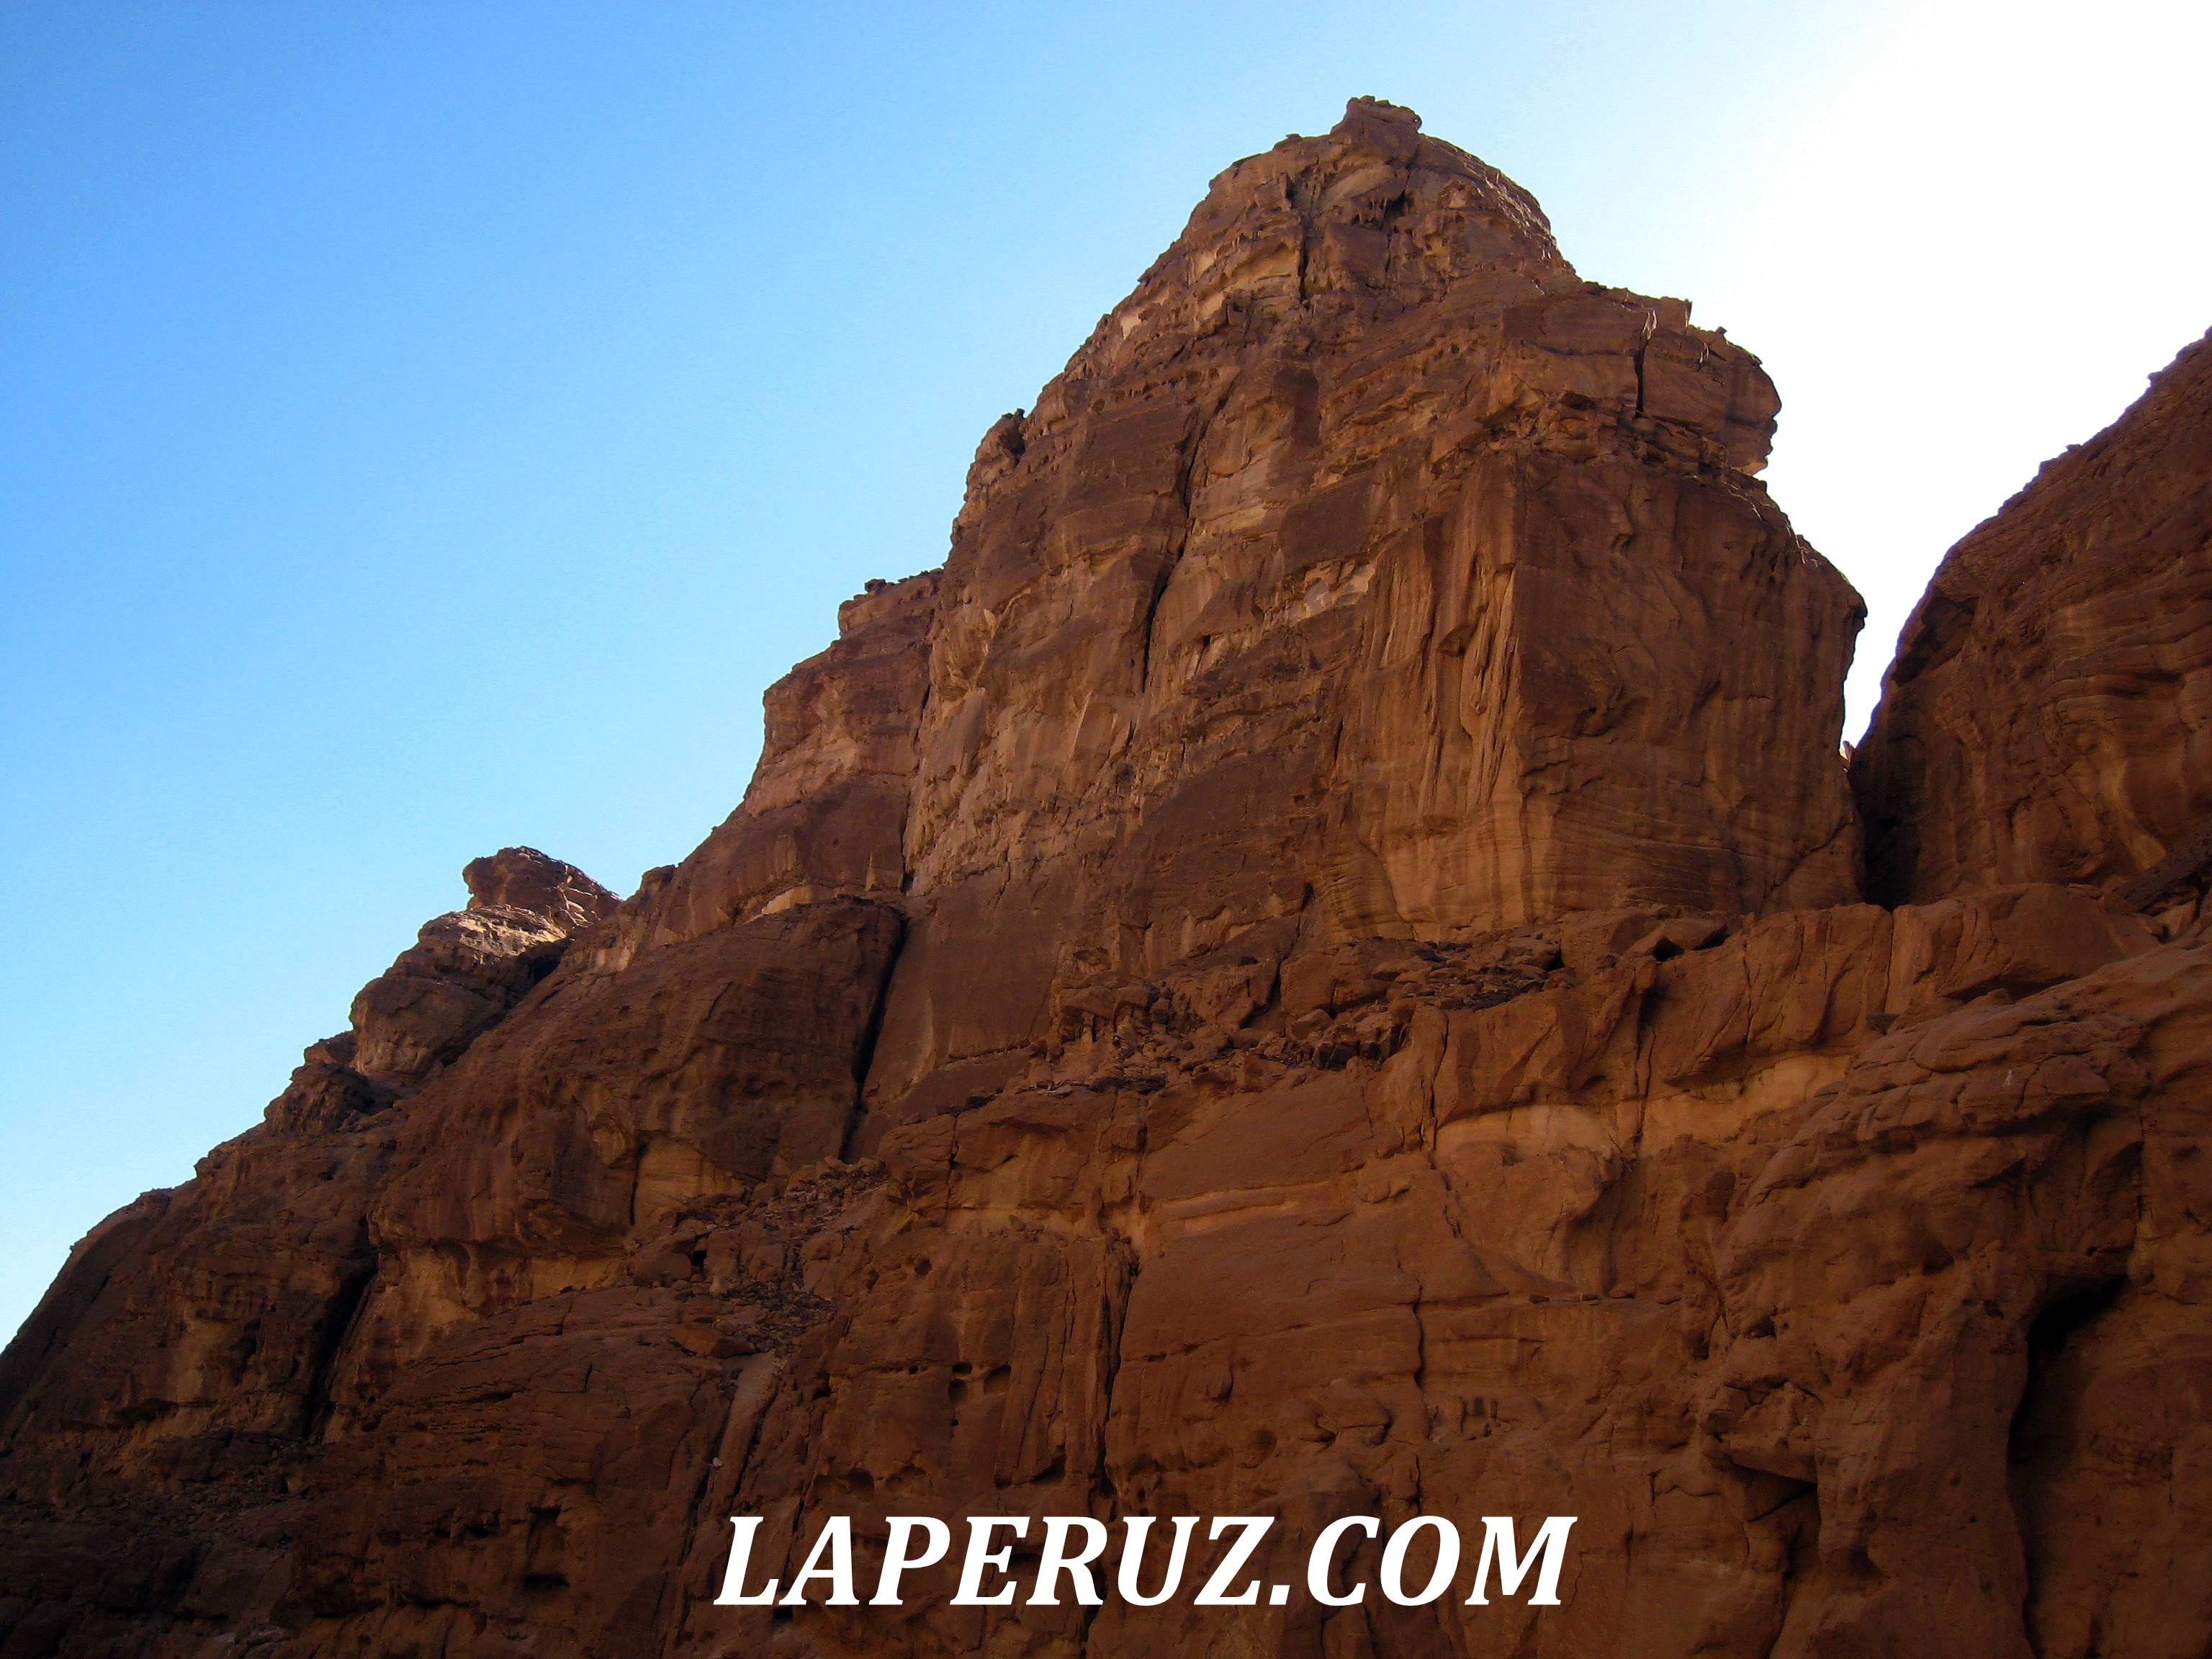 cvetnoi_kanyon_egypt_17